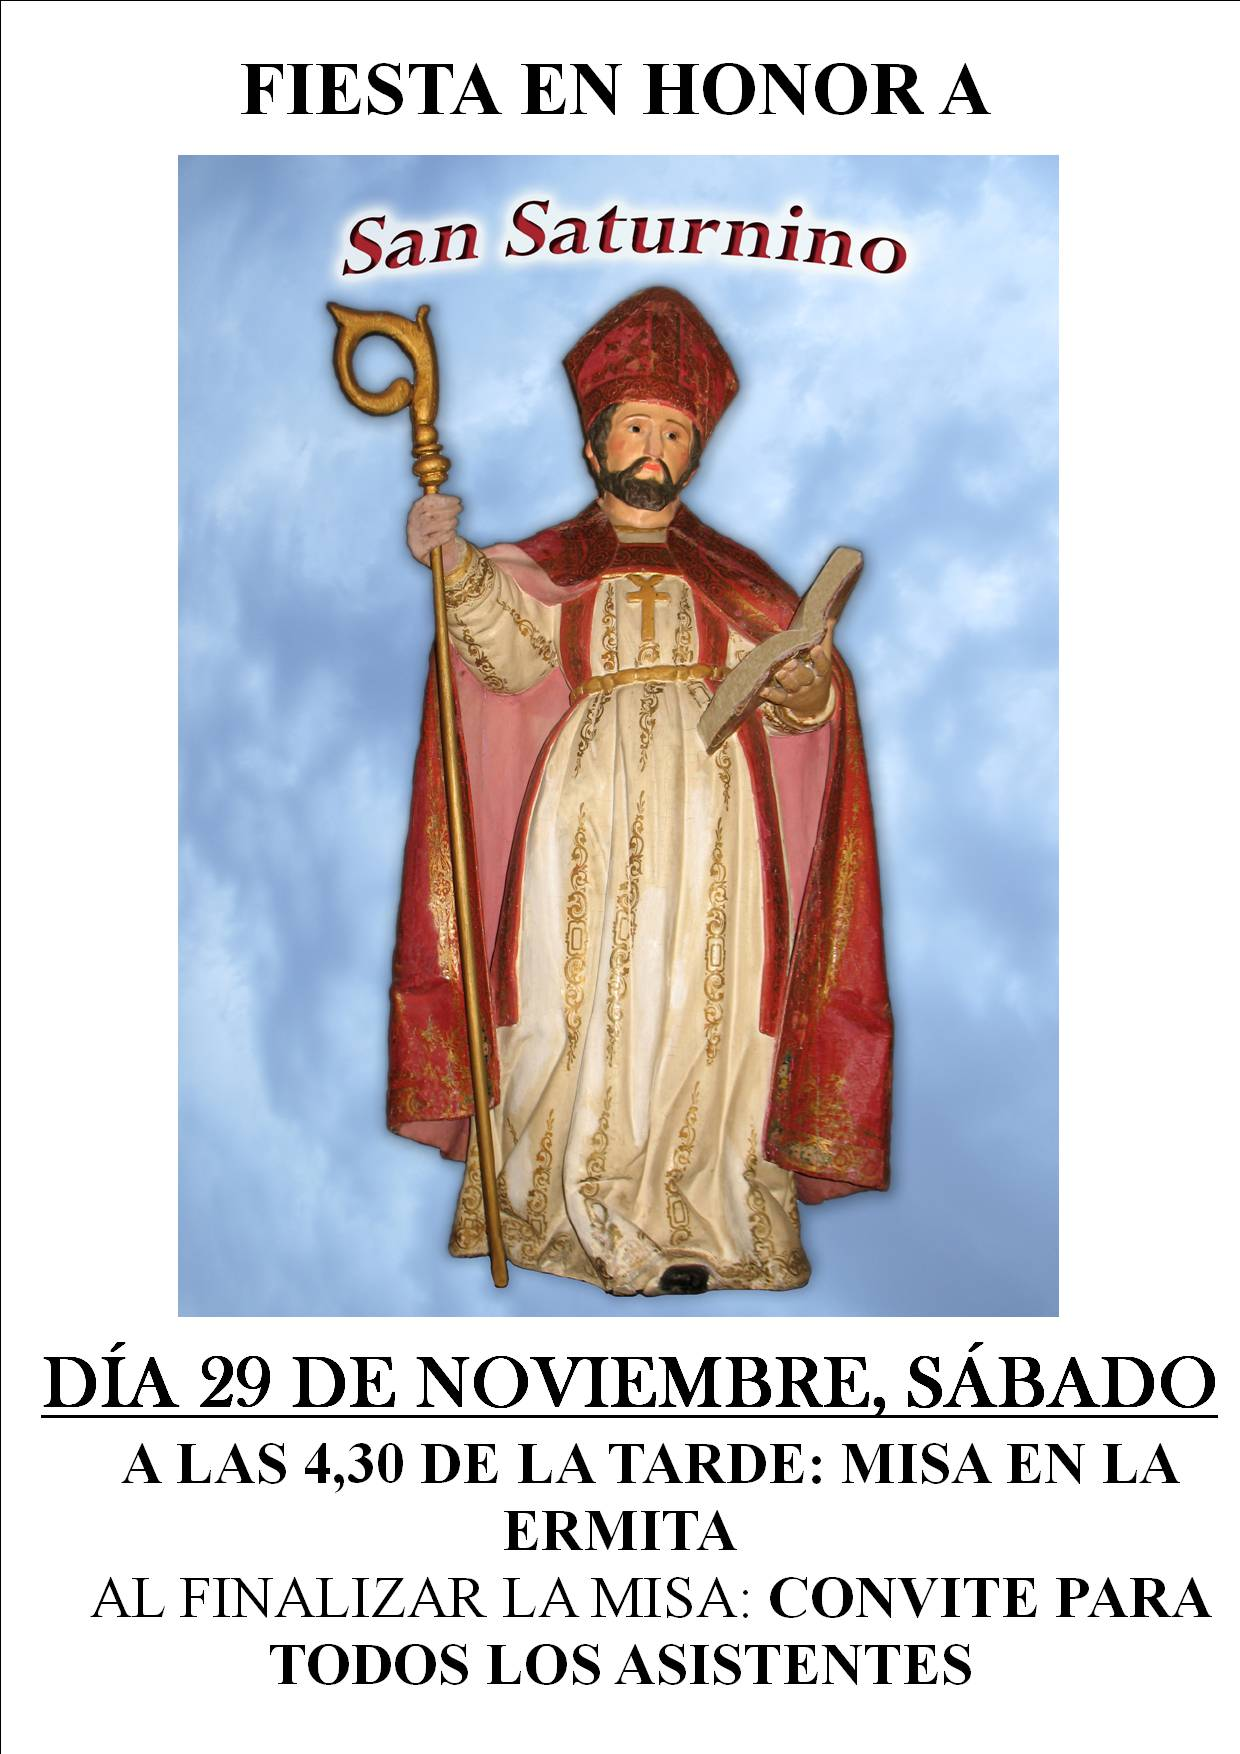 Festividad de San Saturnino